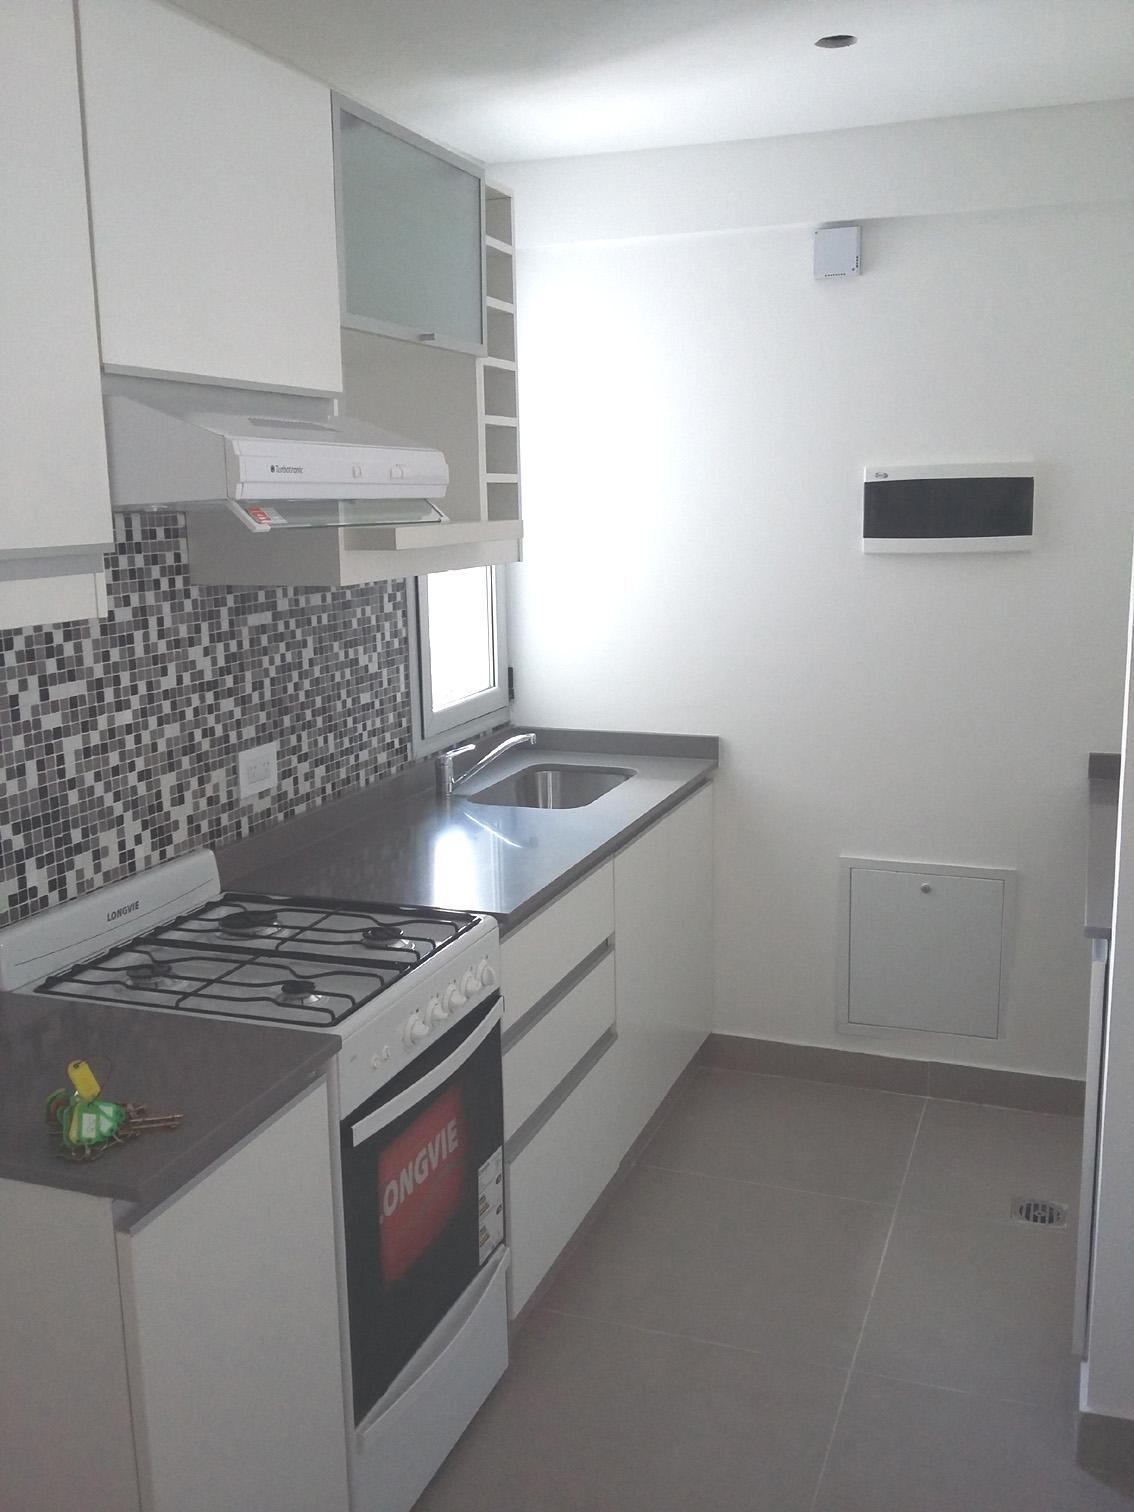 paraguay 5340 cocina 1